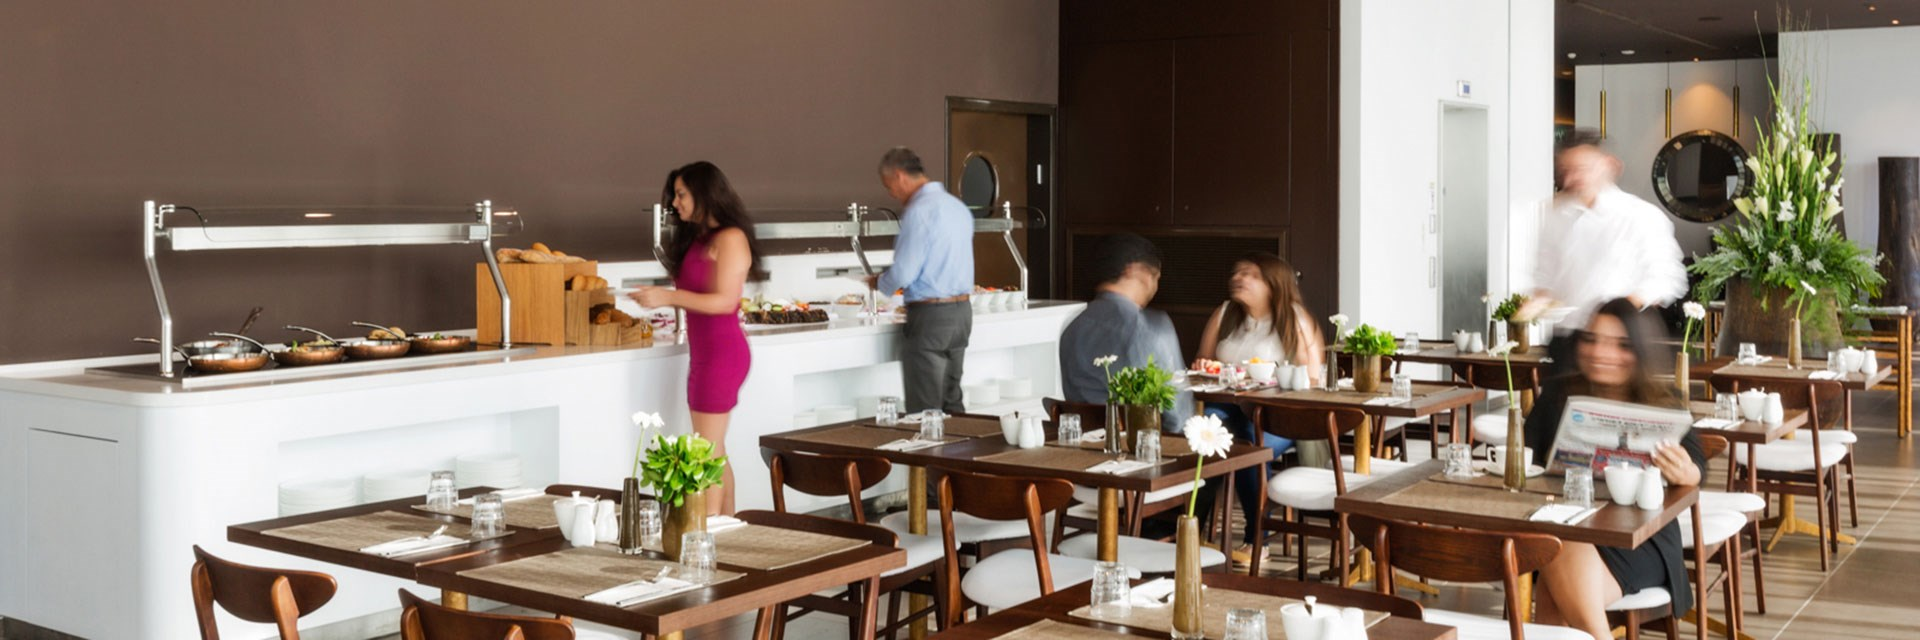 Restaurant and Coffee Bar